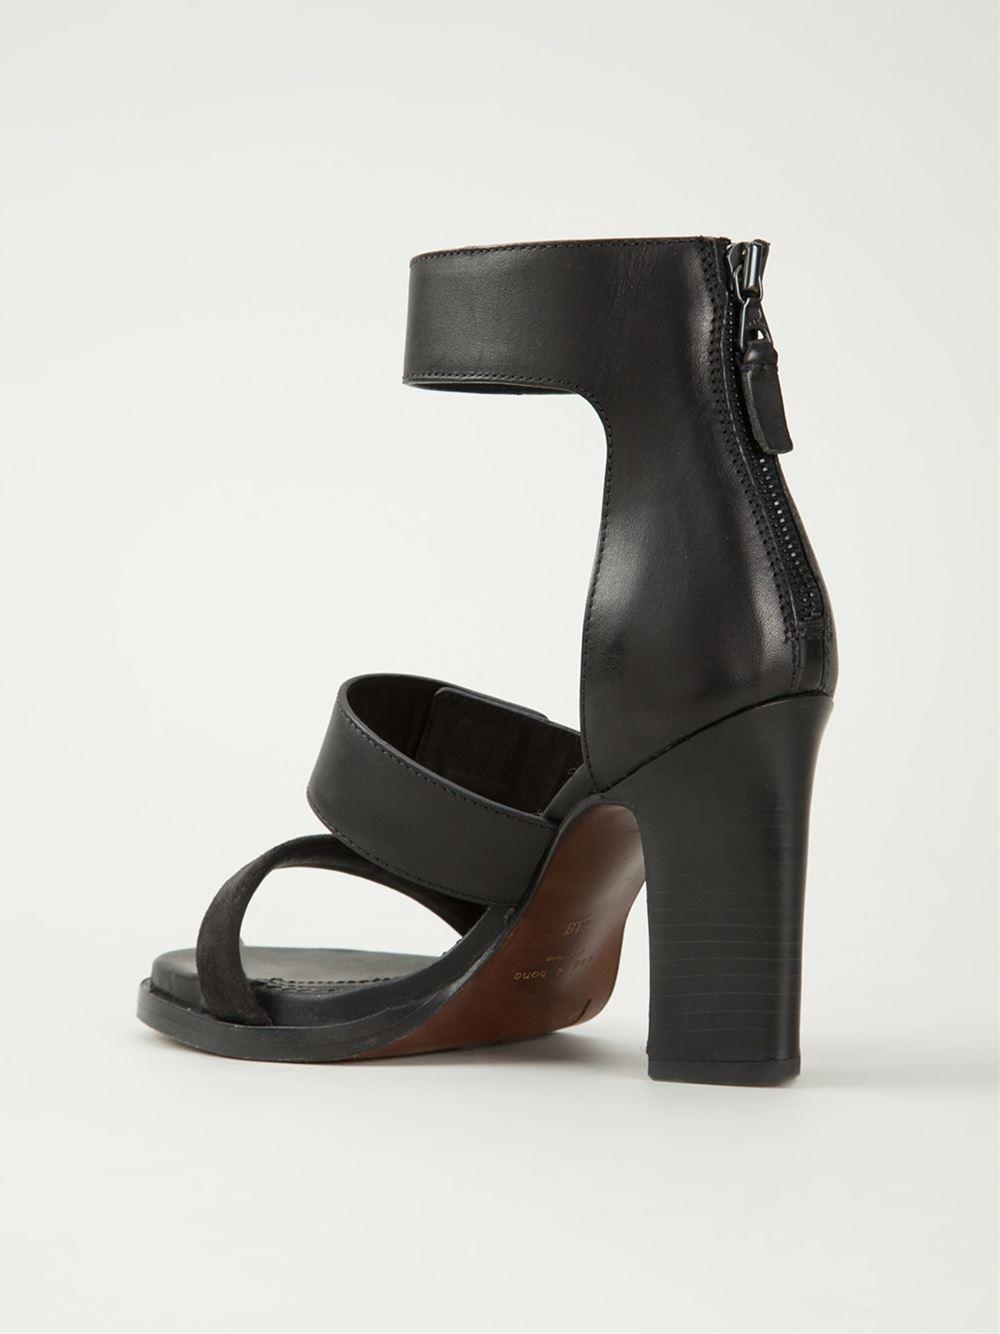 Rag Amp Bone Block Heel Leather Sandals In Black Lyst